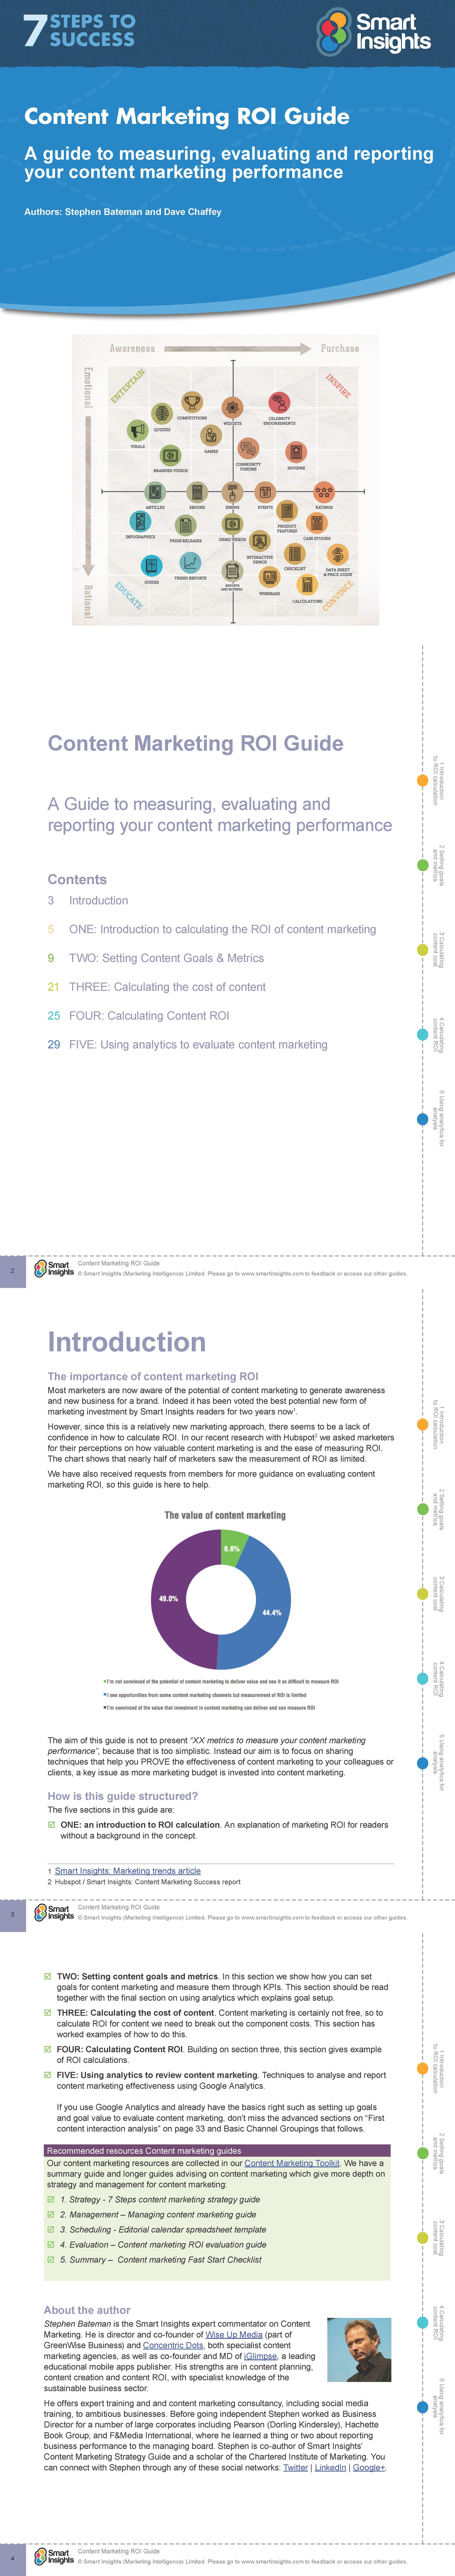 Evaluating Content Marketing ROI Guide